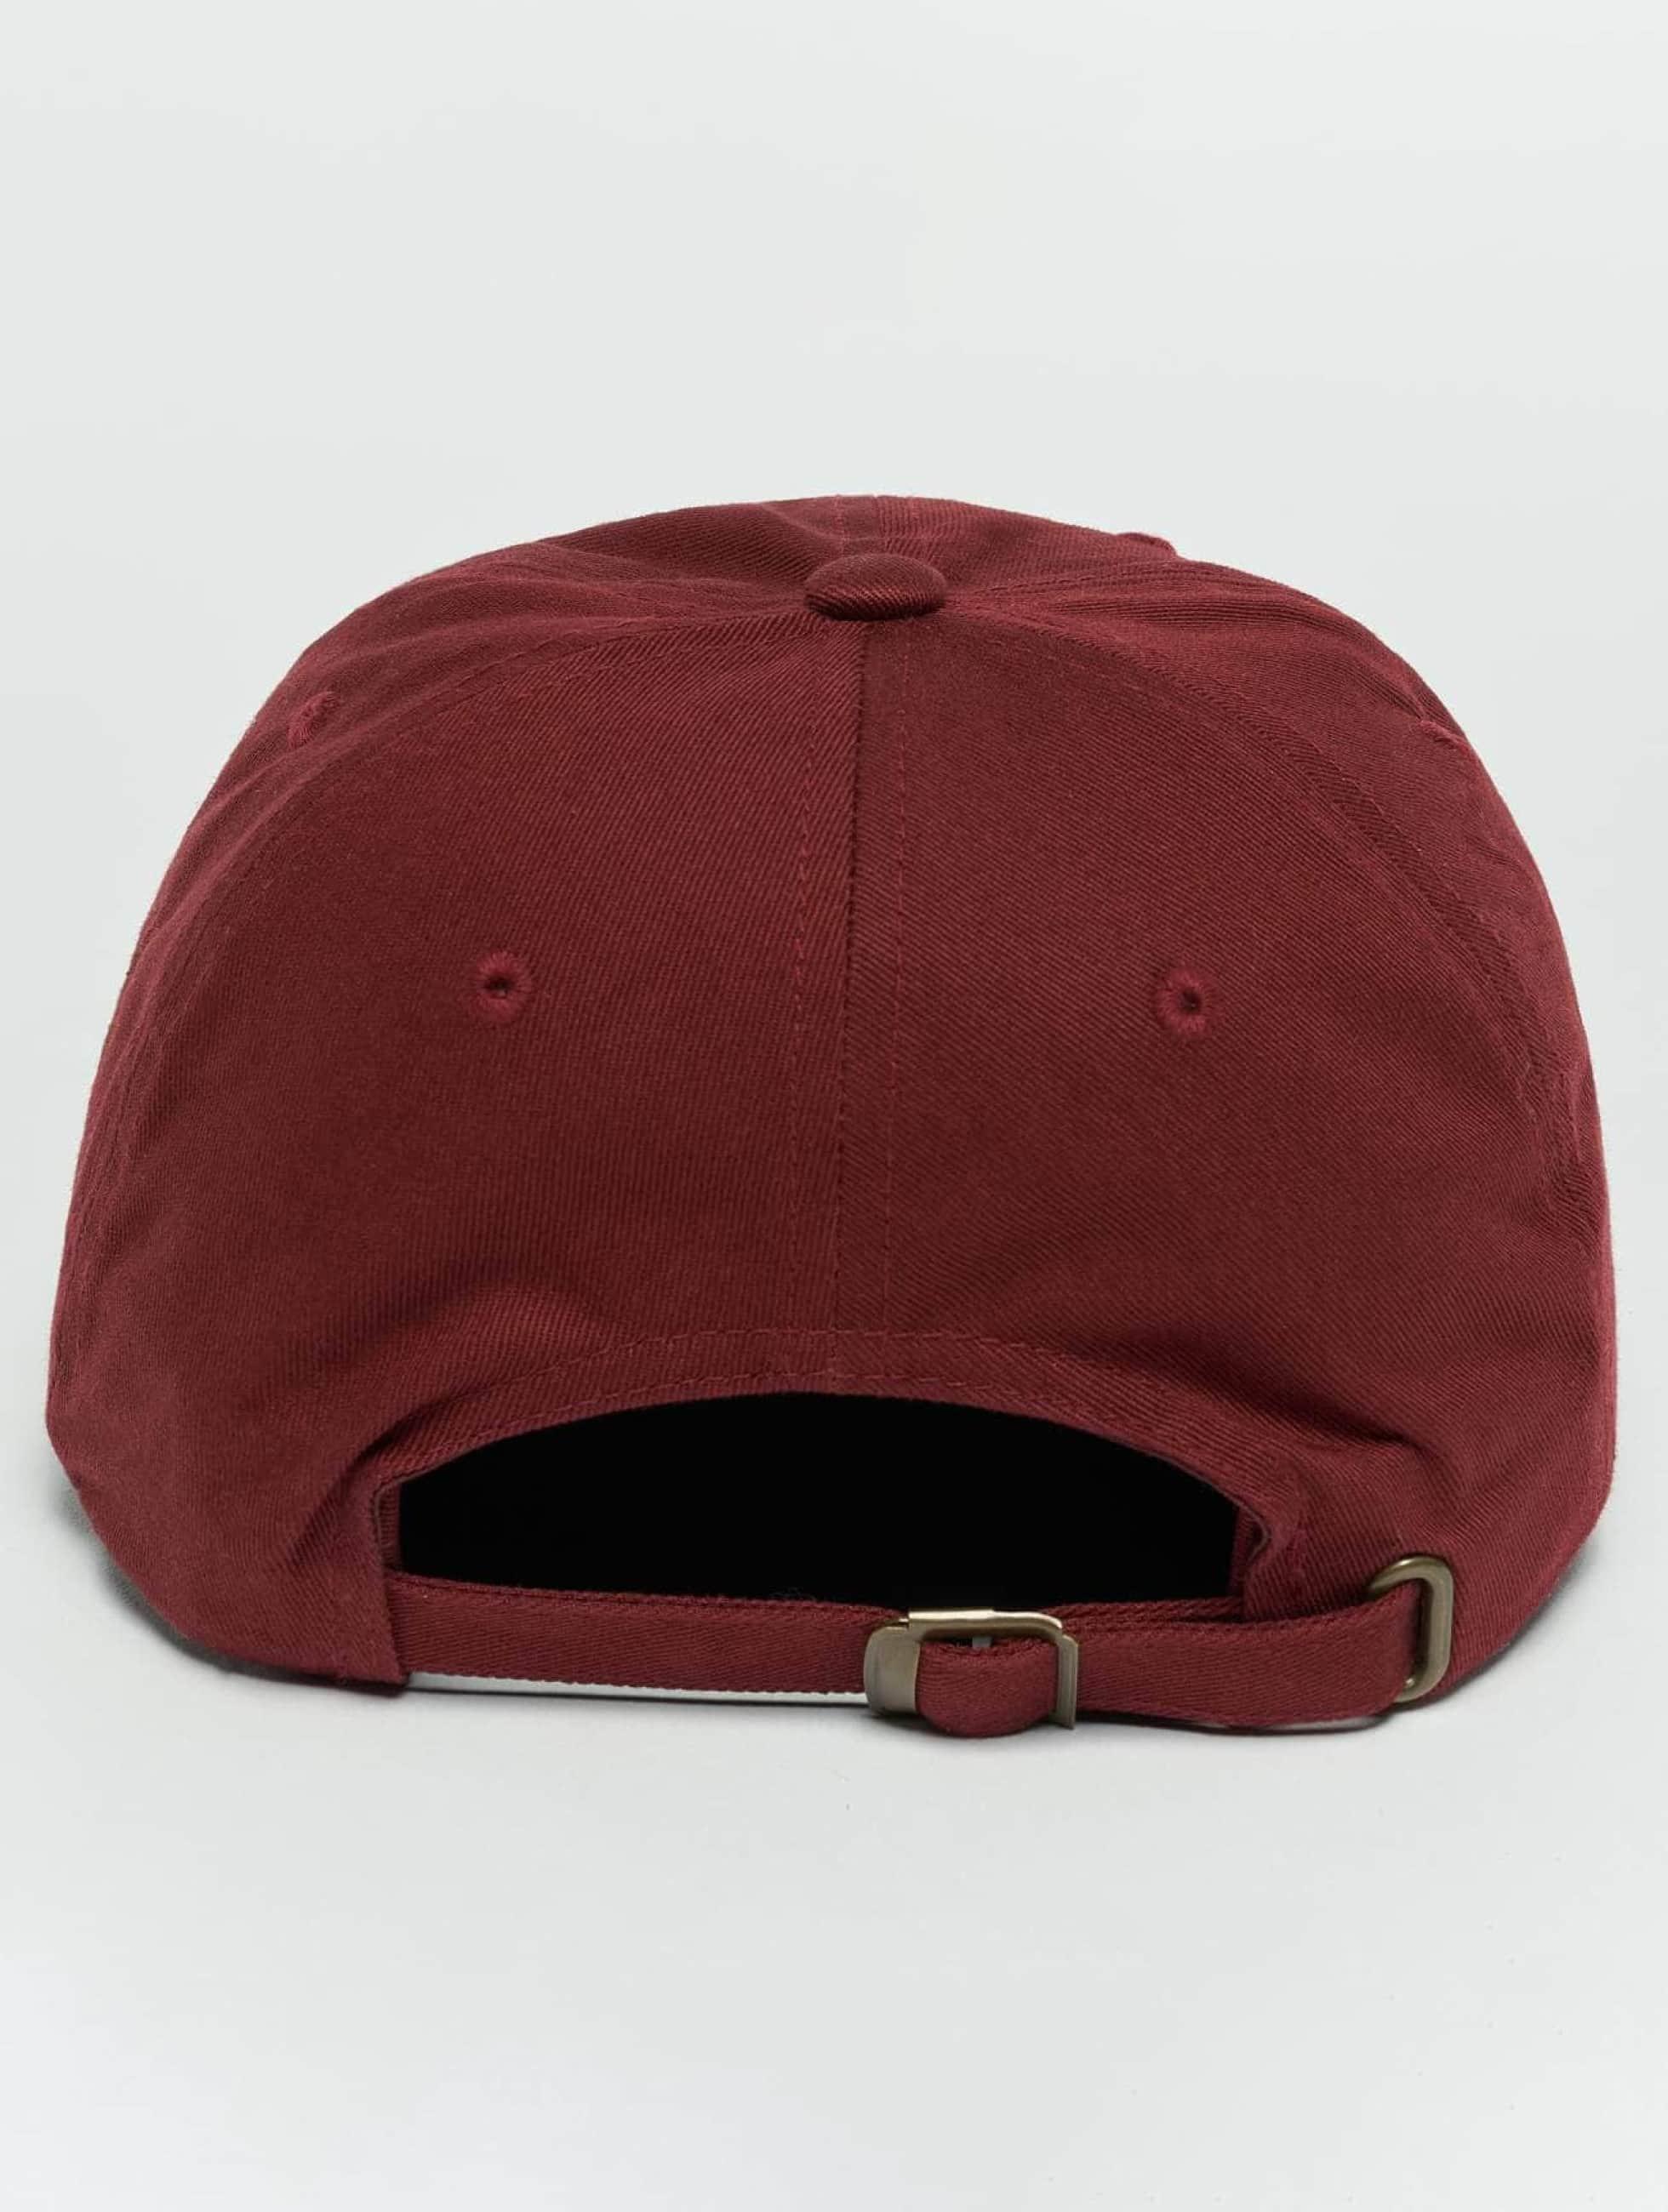 TurnUP Casquette Snapback & Strapback Neigschaut rouge